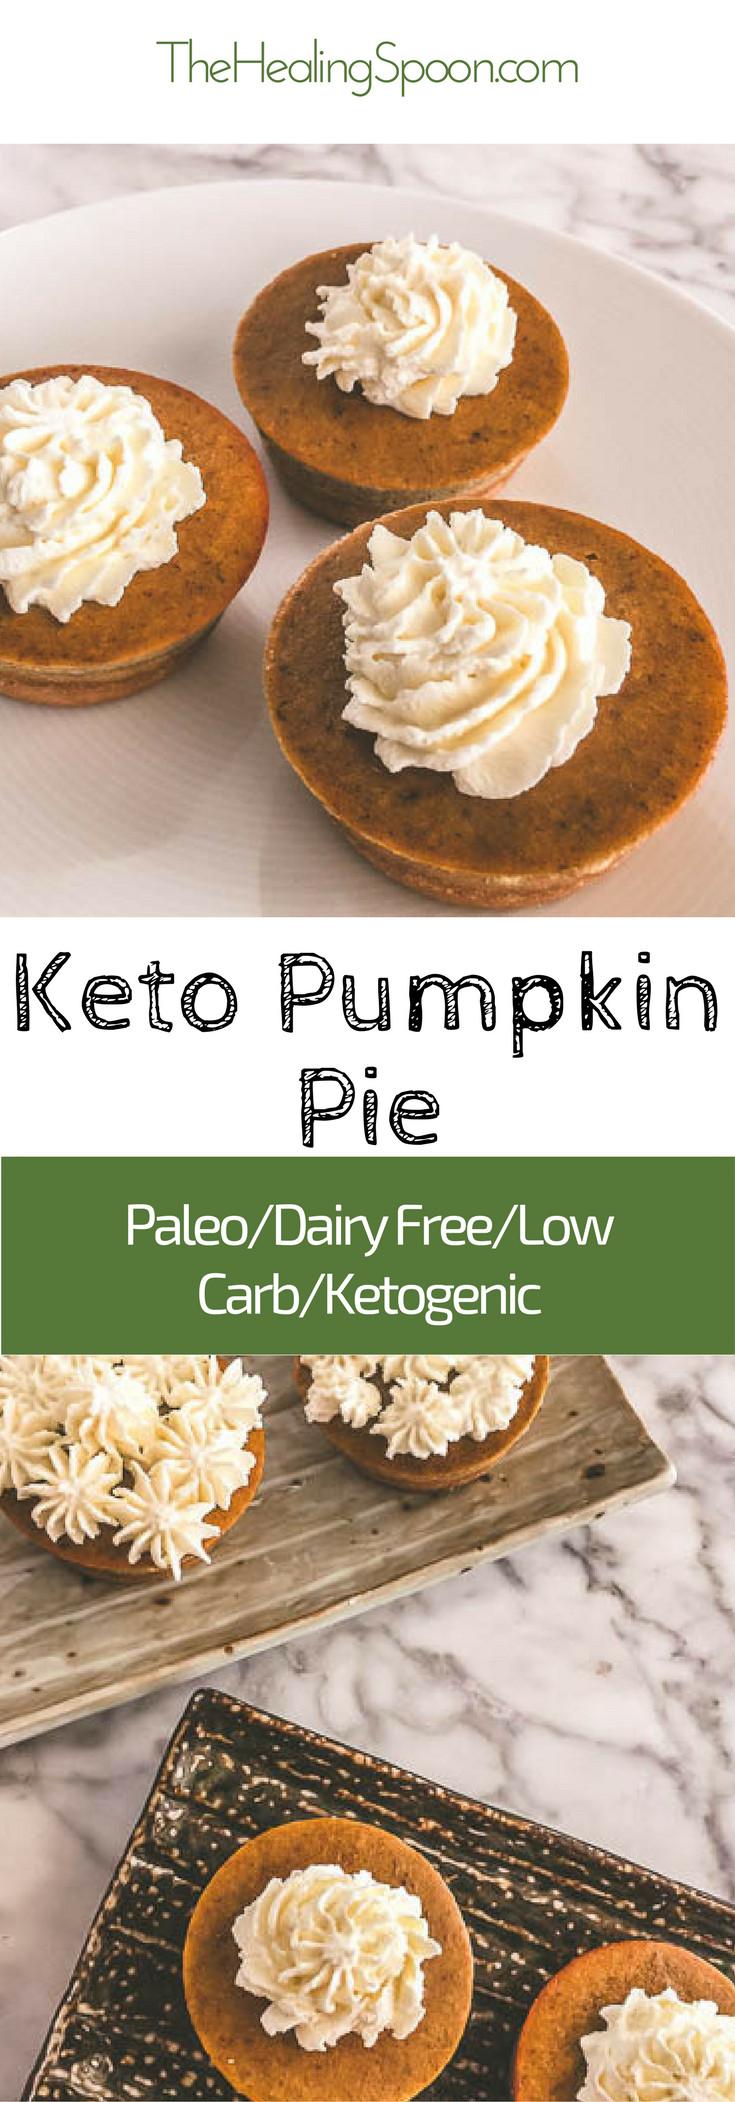 Keto Dairy Free Desserts  keto low carb dairy free paleo mini pumpkin pie